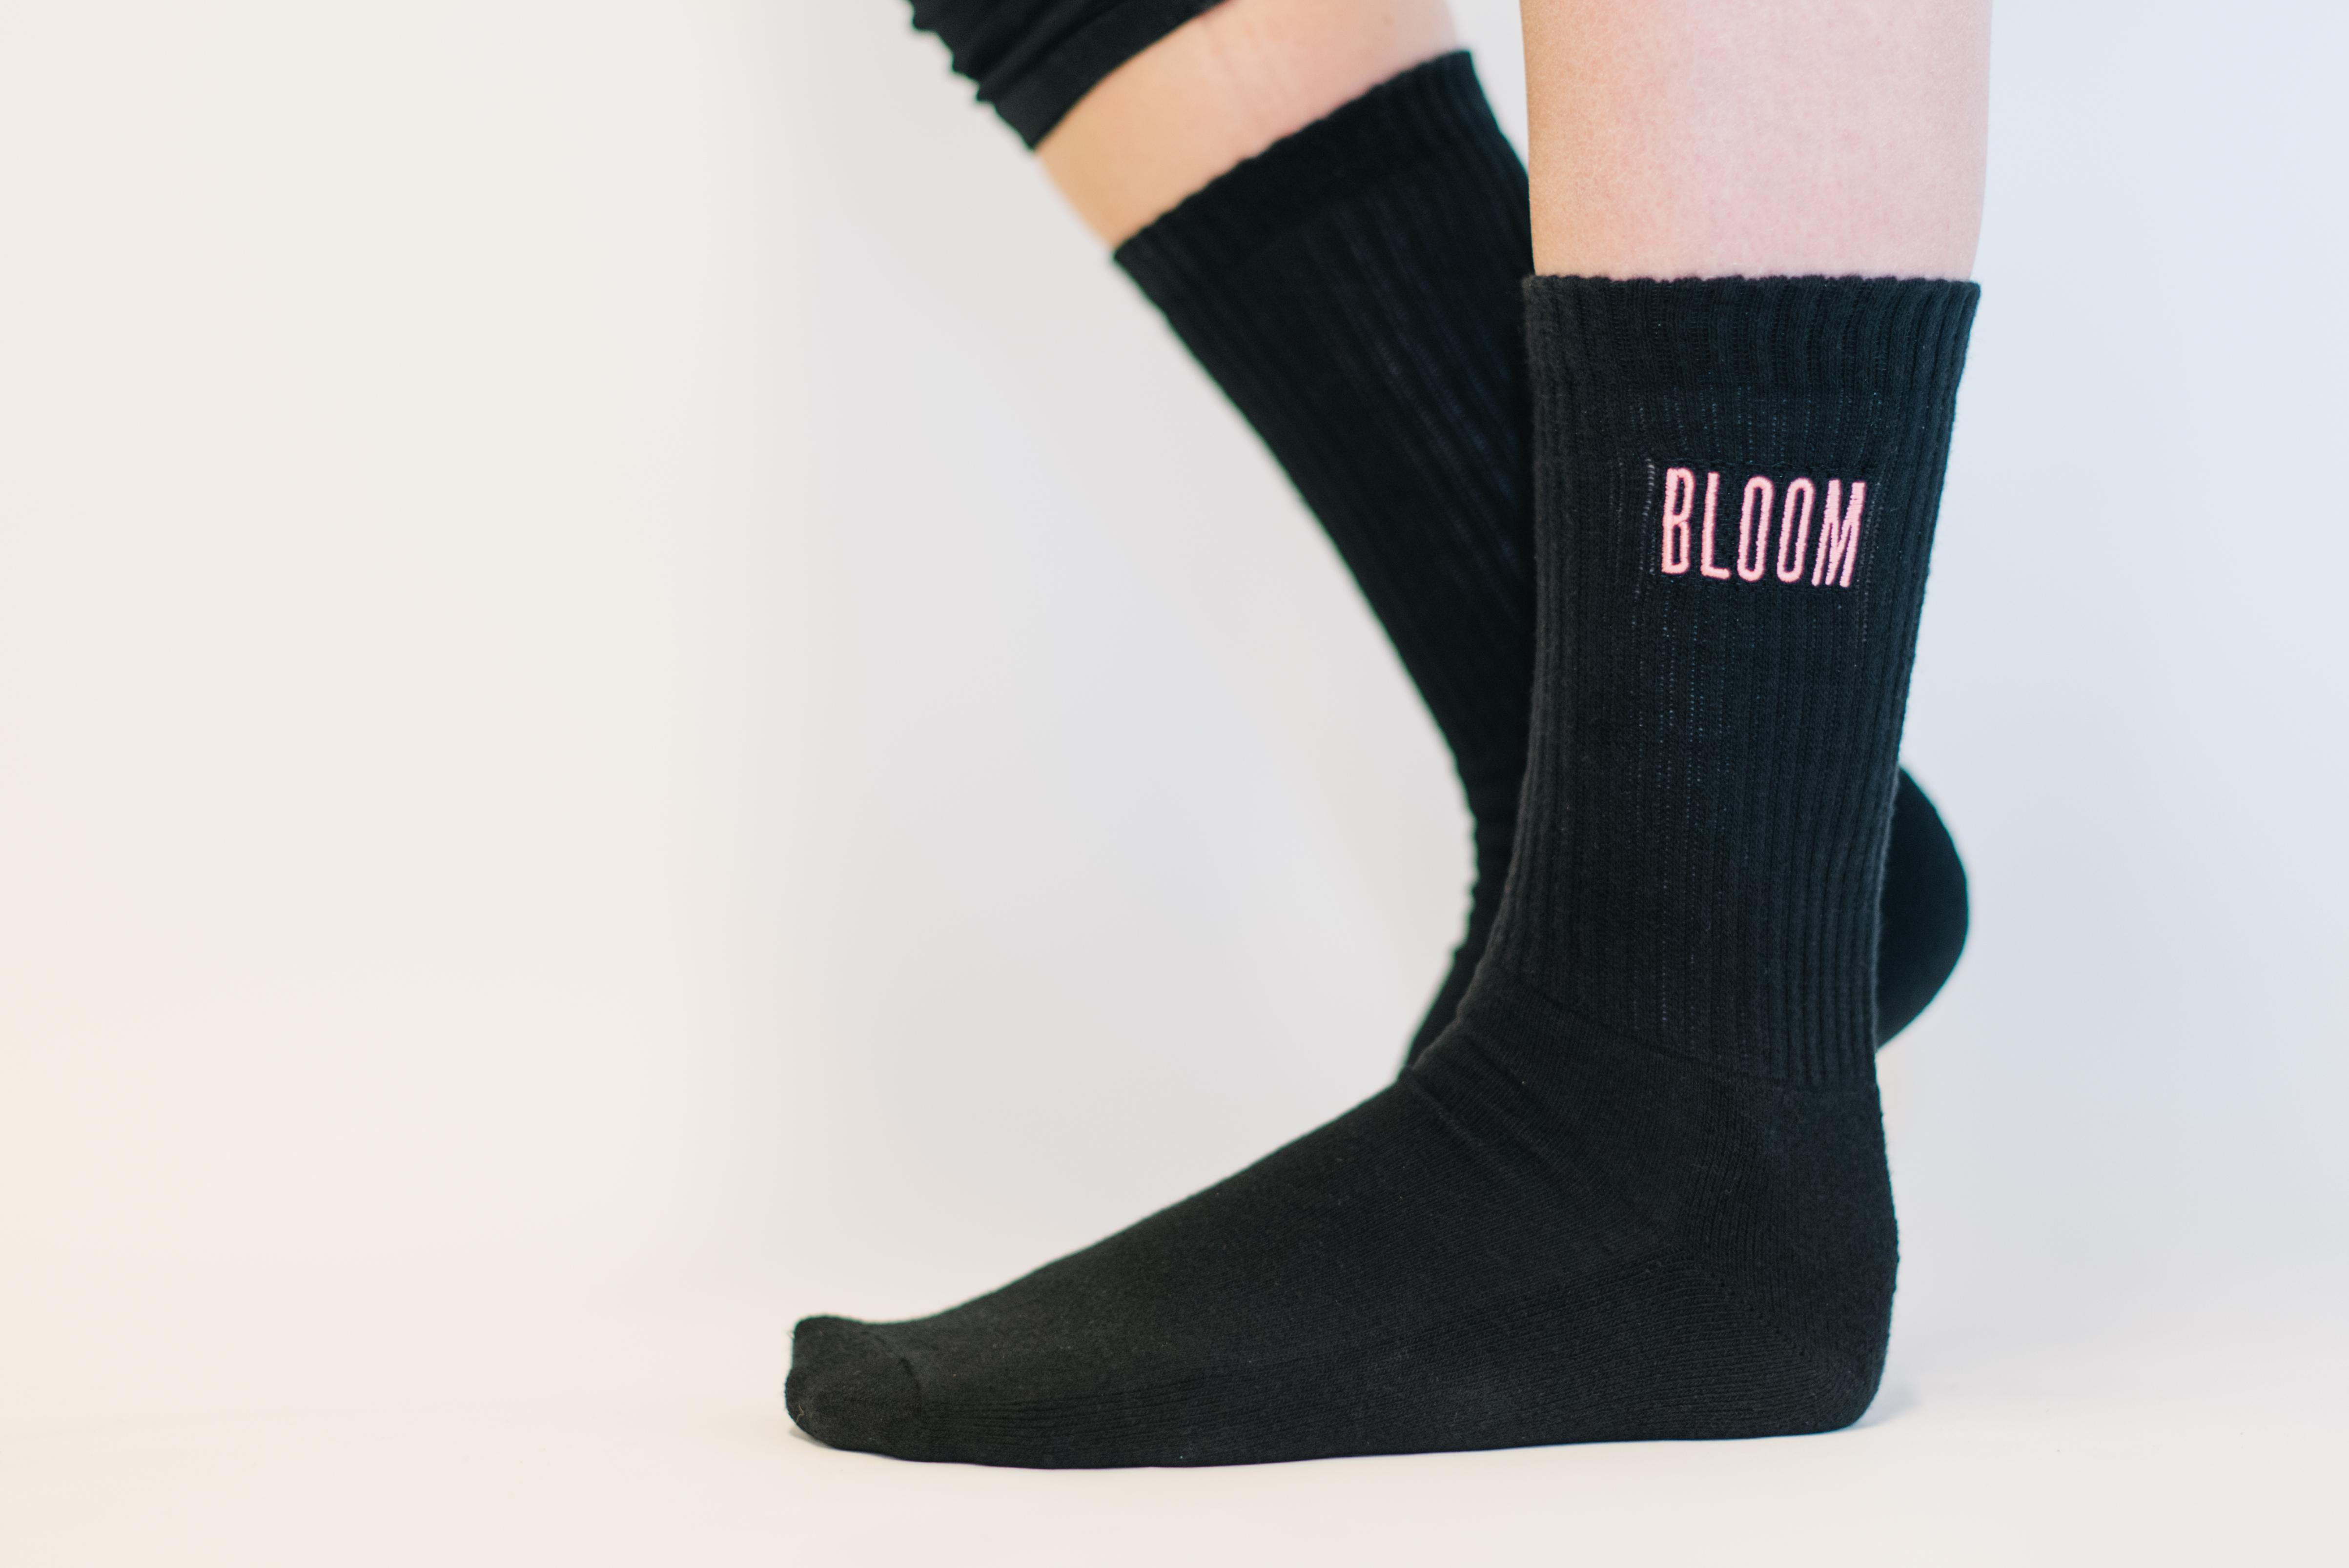 Bloom Black Socks - Lewis Capaldi